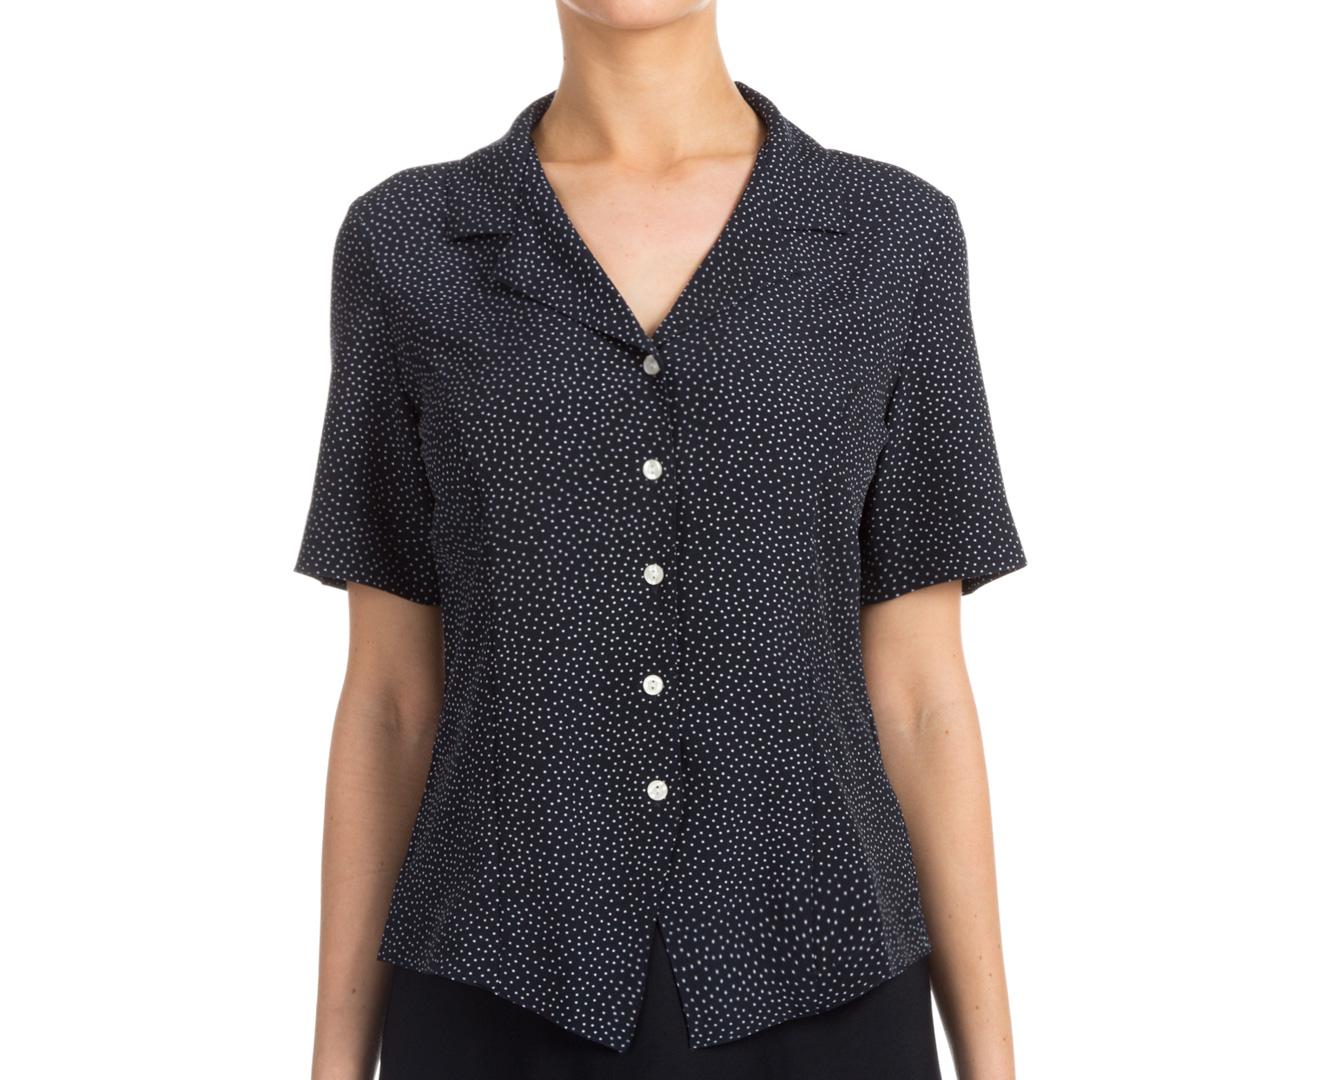 Stylecorp Women 39 S Short Sleeve Polka Dot Shirt Navy